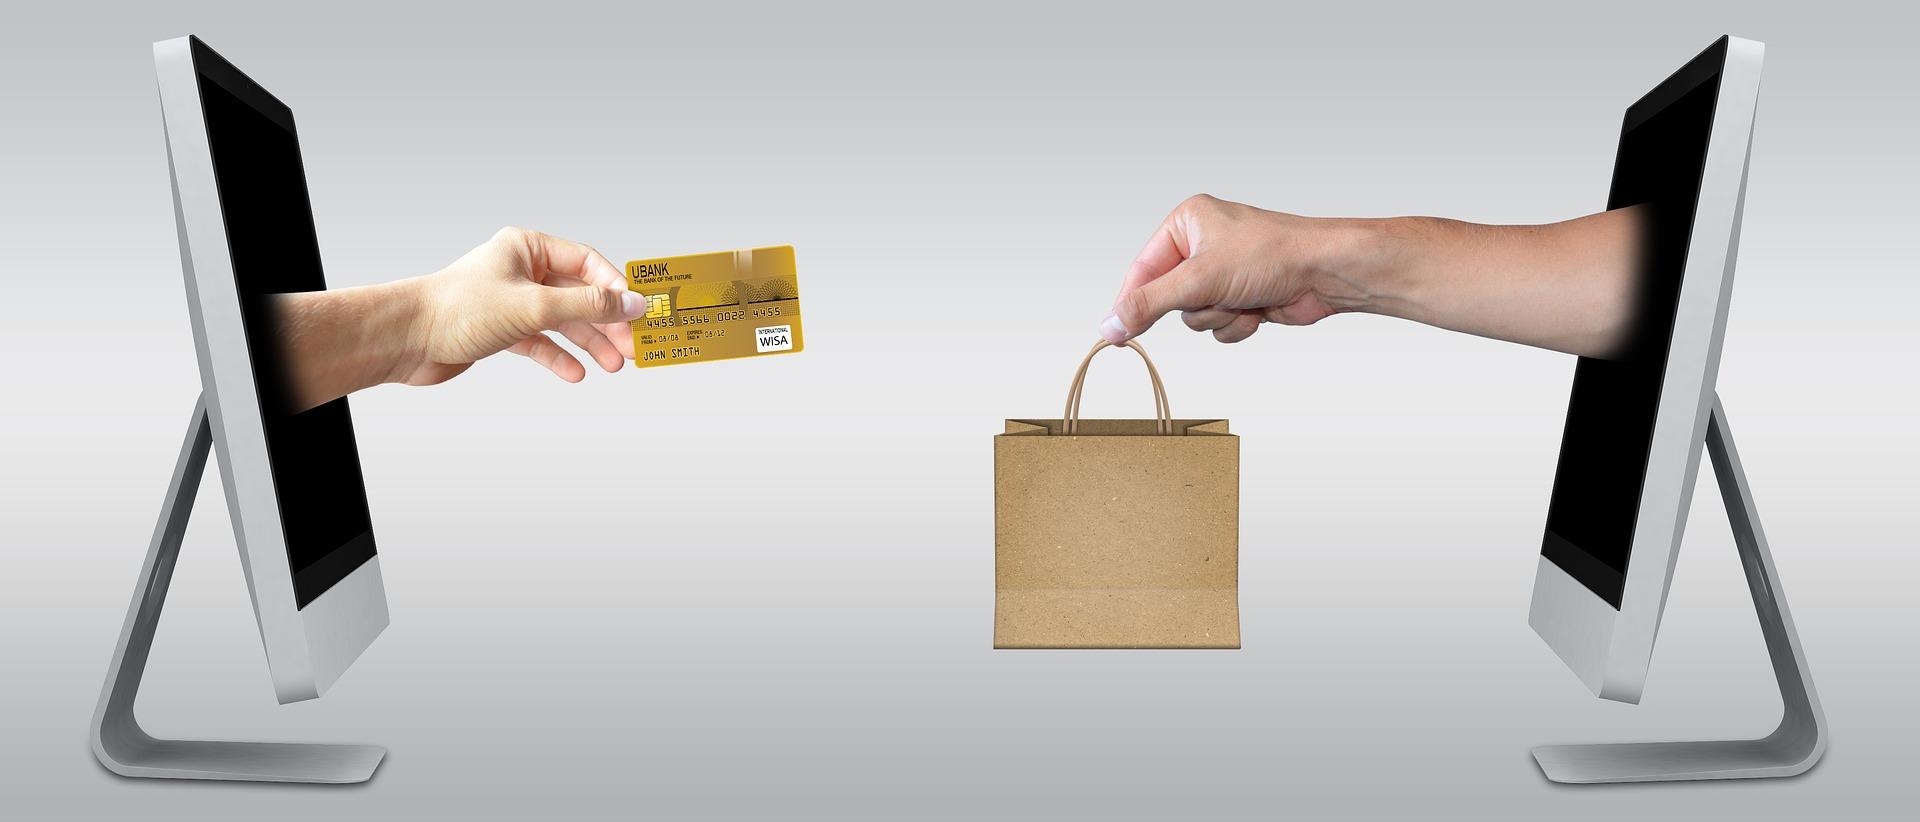 Waspadai Penipuan Transaksi Online